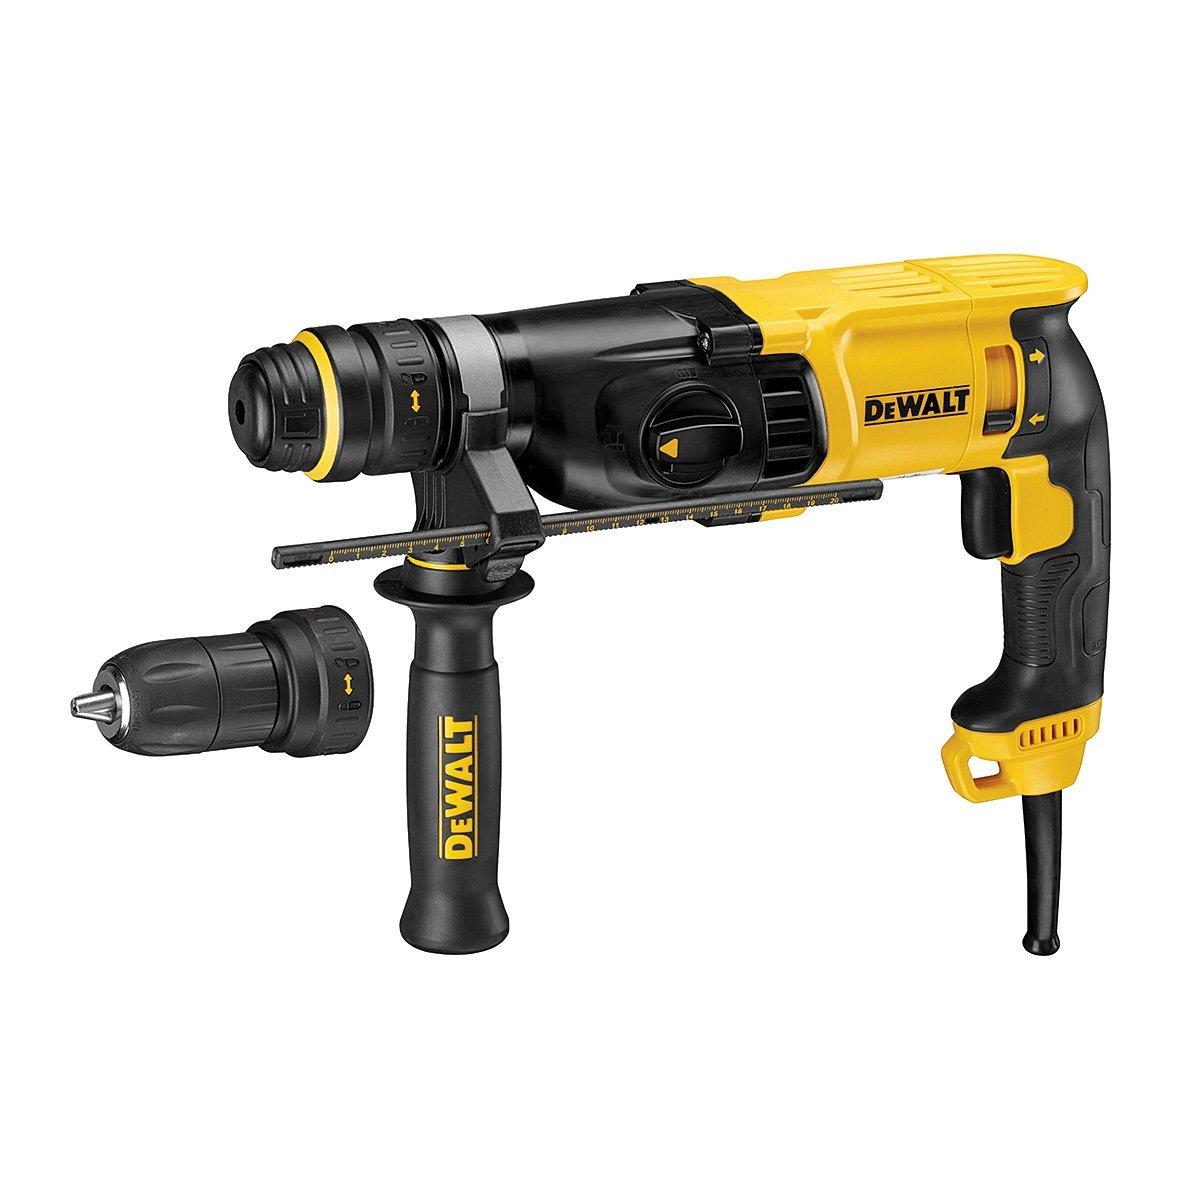 615nHqXMpyL._SL1200_ Avis Bosch GBH2400 Perforateur Burineur